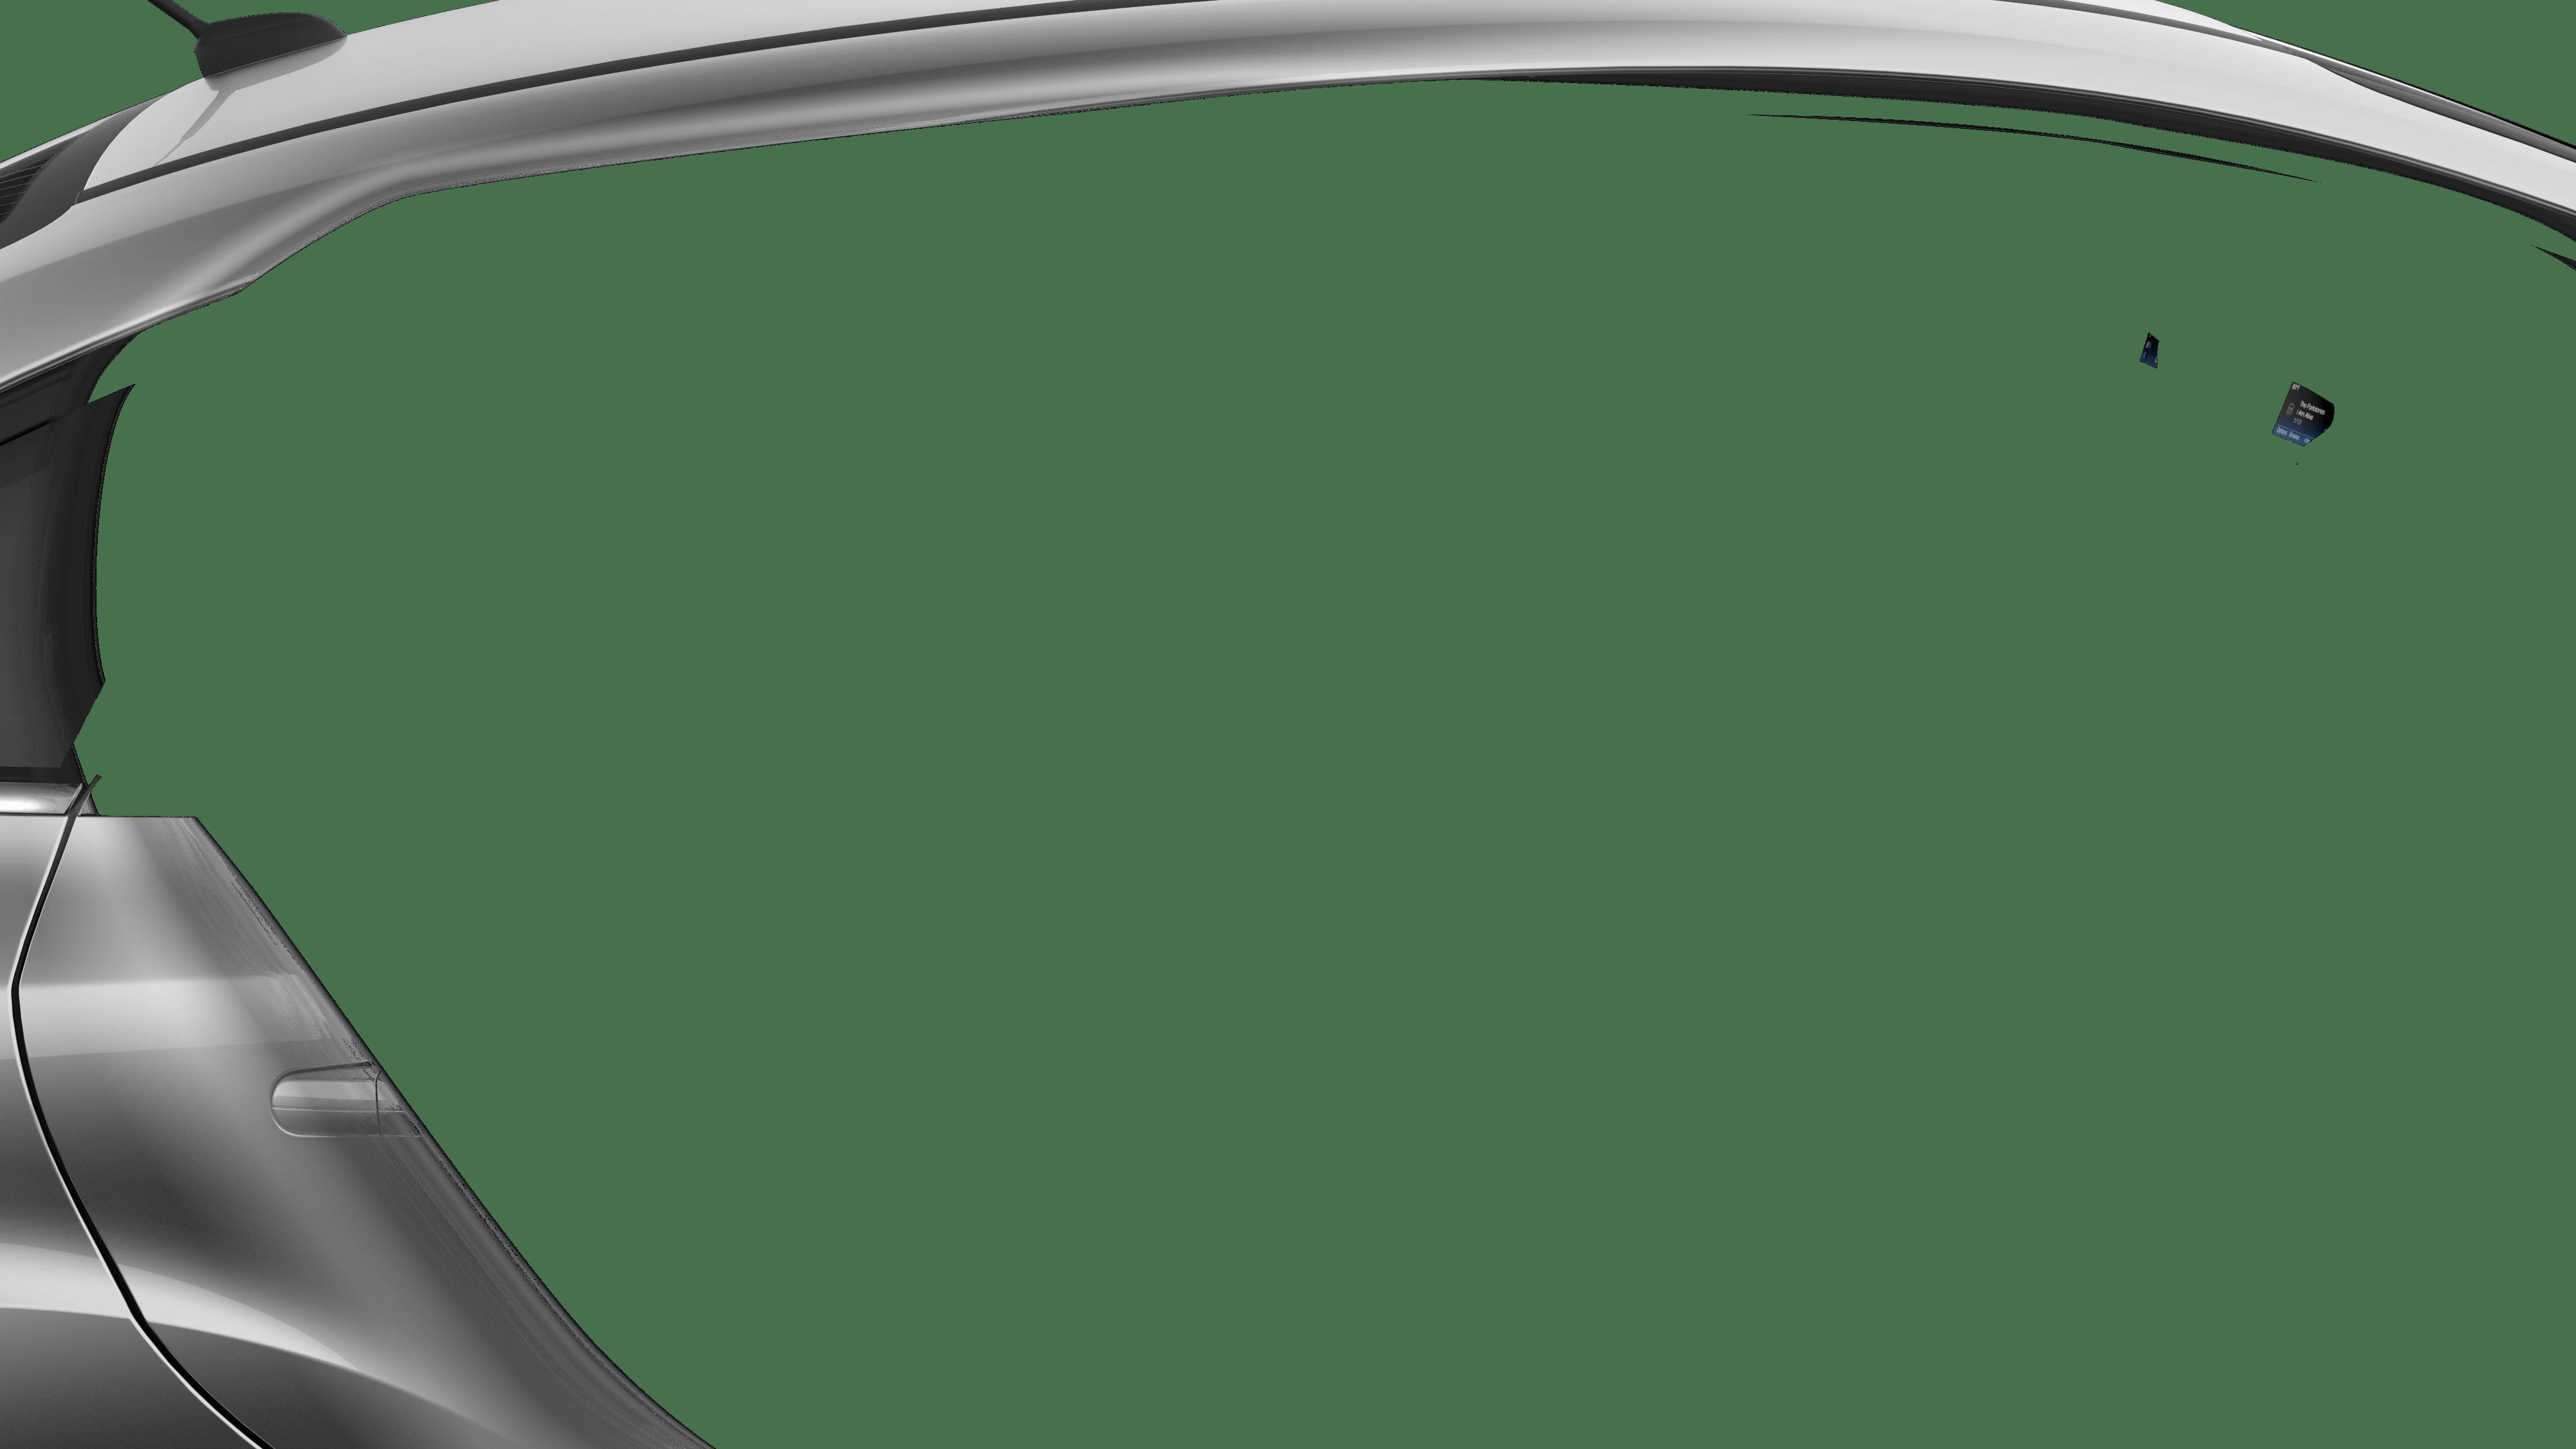 2018 ford focus for sale in fort pierce 1fadp3f21jl227291 sunrise ford. Black Bedroom Furniture Sets. Home Design Ideas